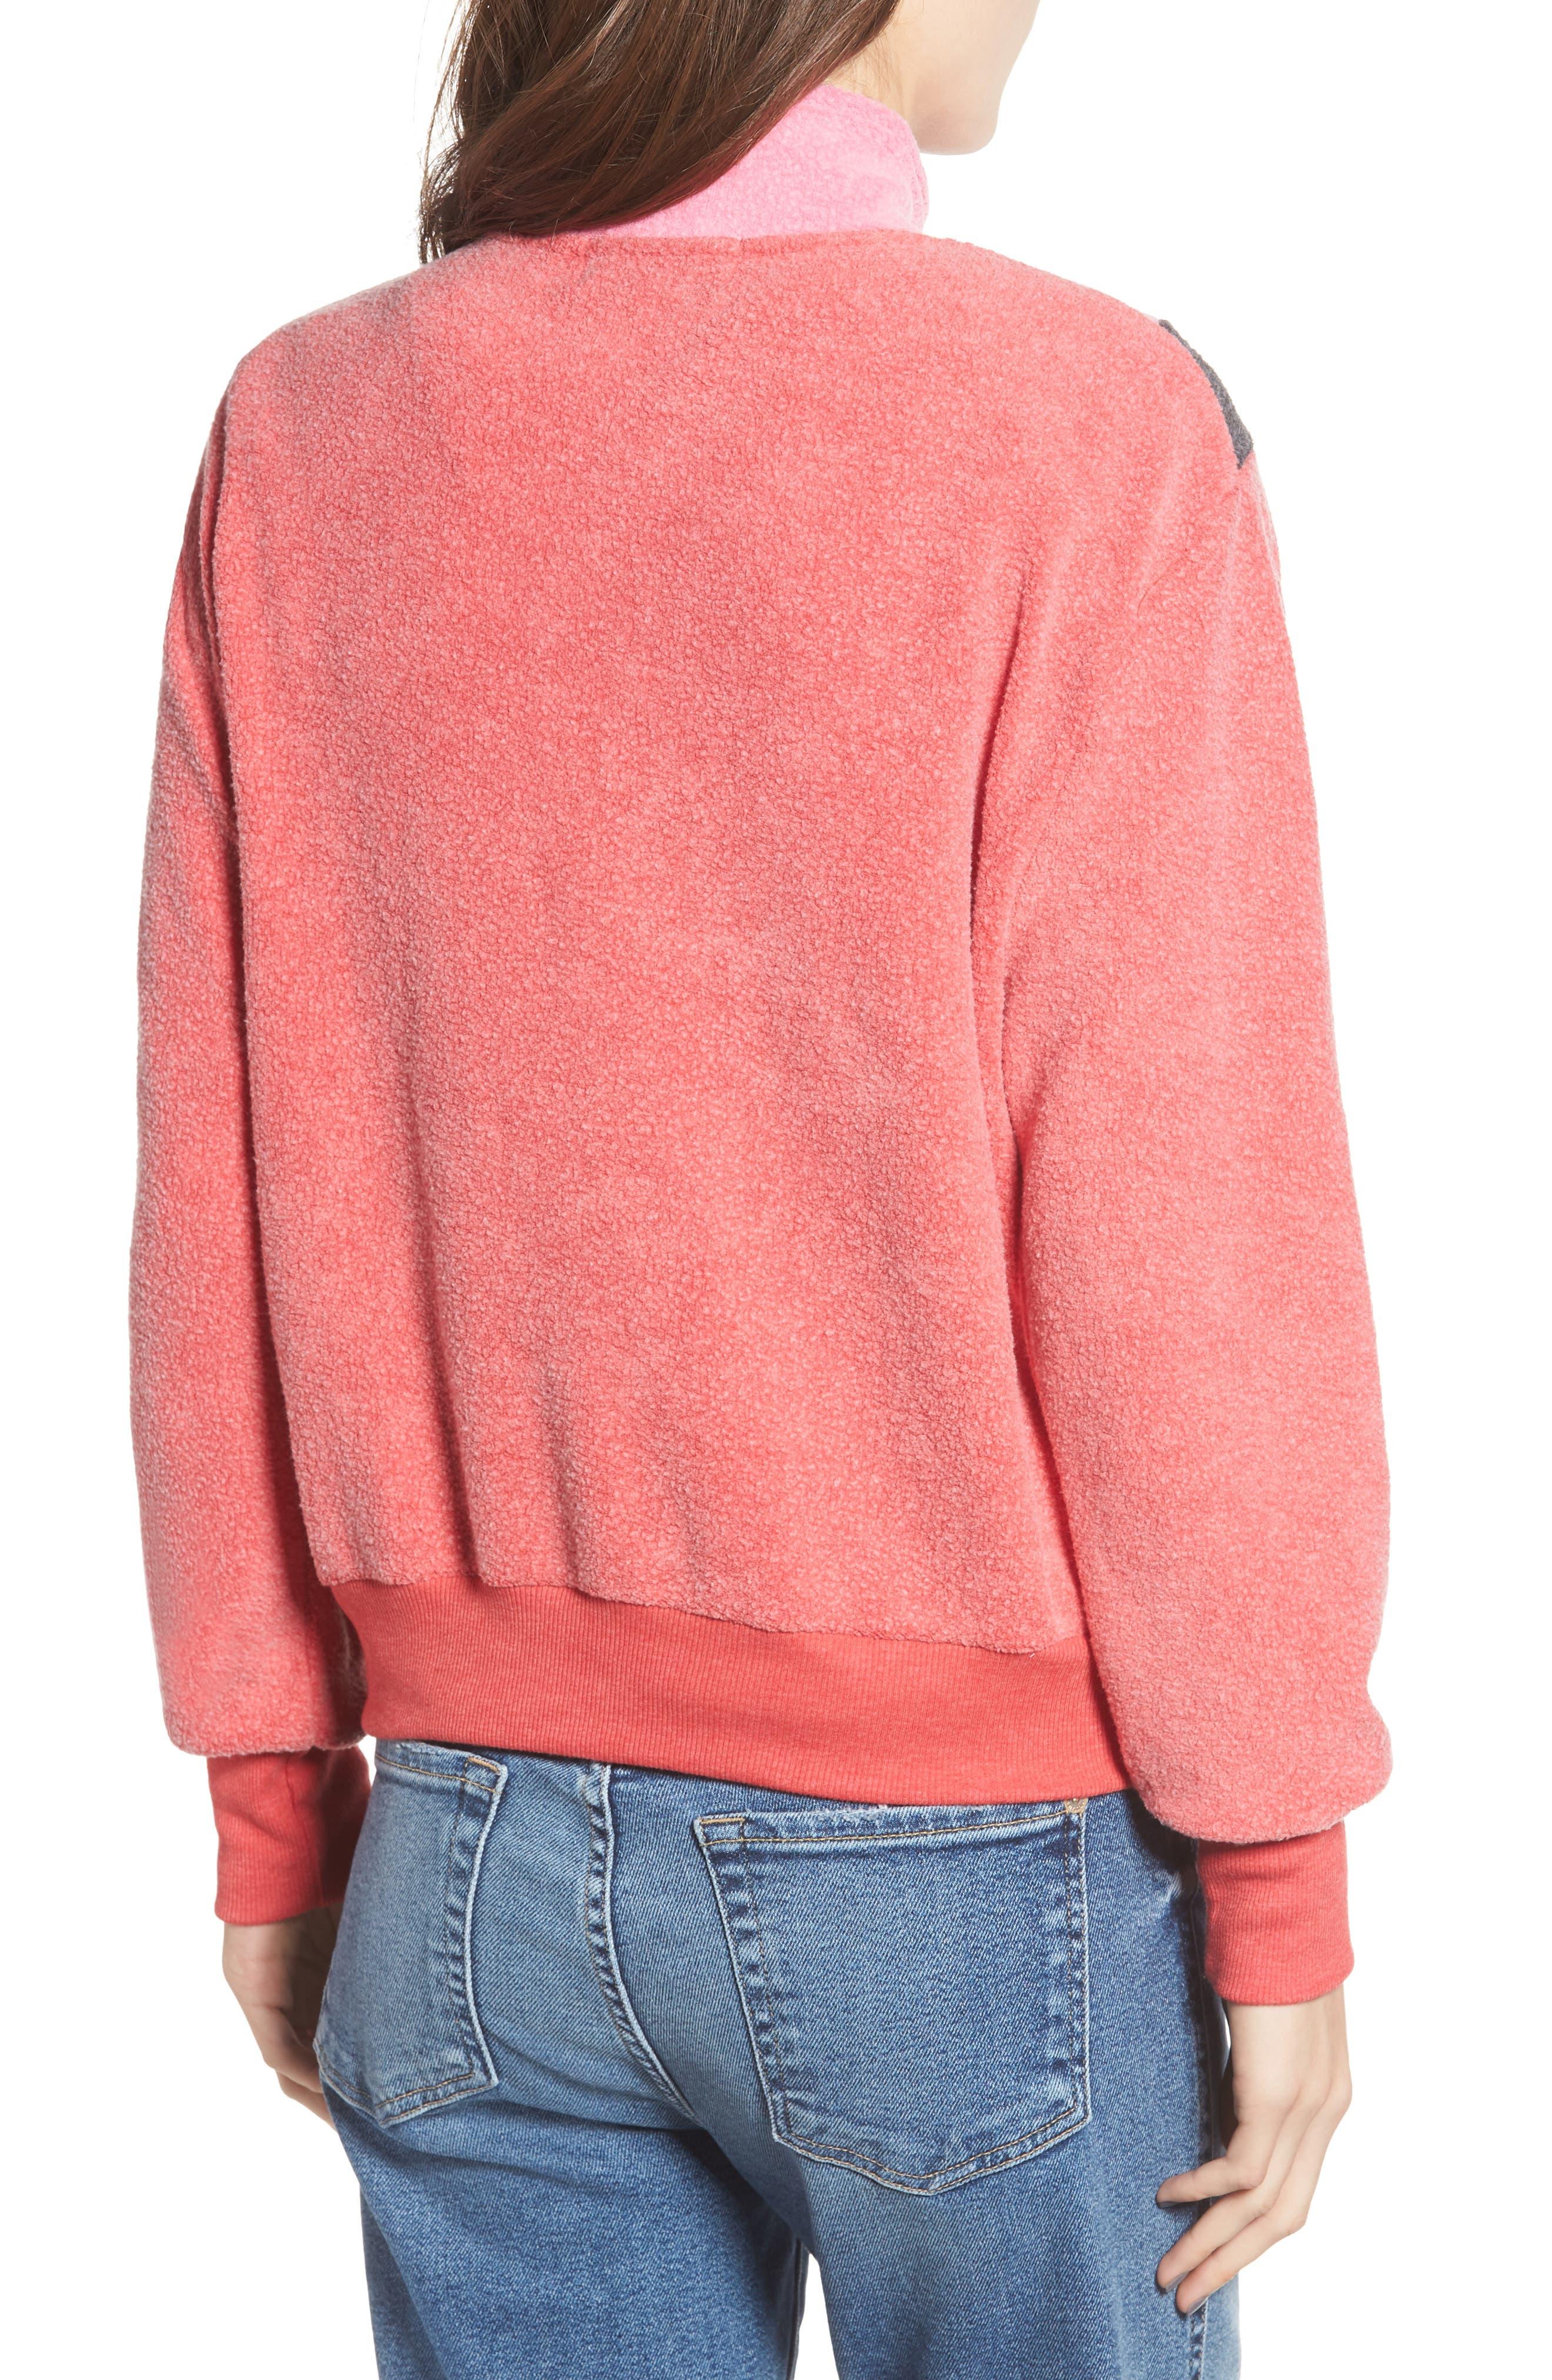 Soto Warm-Up Sweatshirt,                             Alternate thumbnail 2, color,                             SCARLET